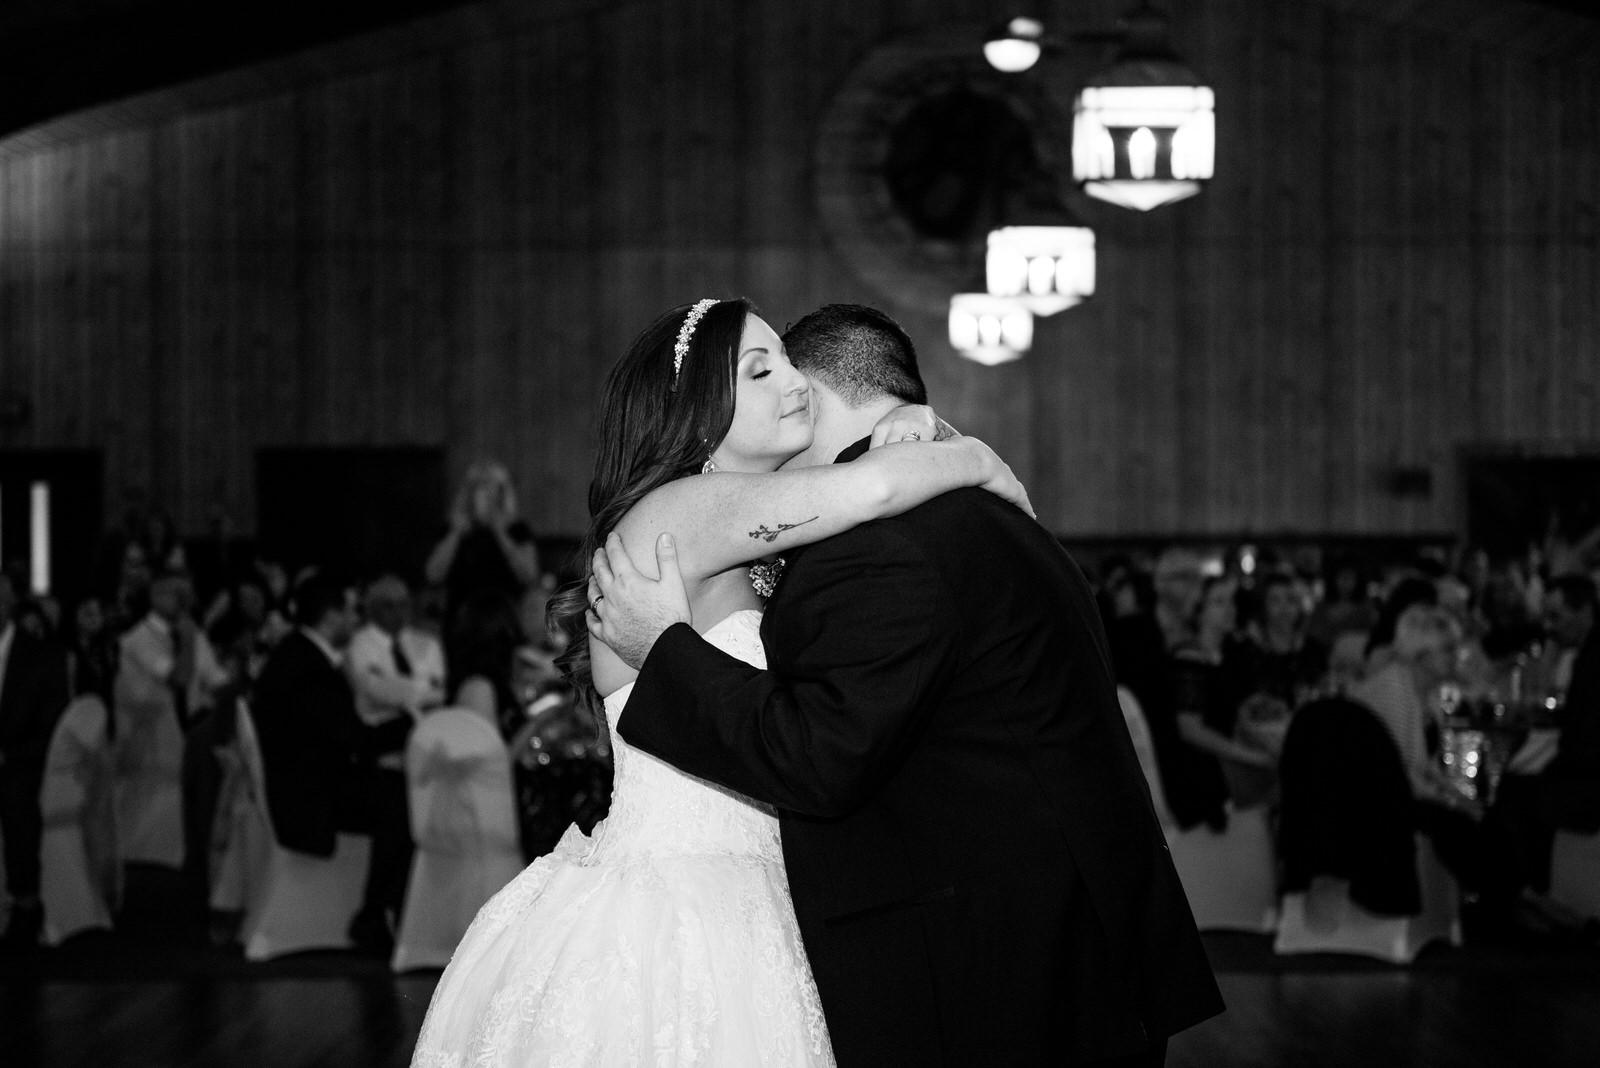 Laube_Banquet_Hall__Wedding_Photos_074.jpg